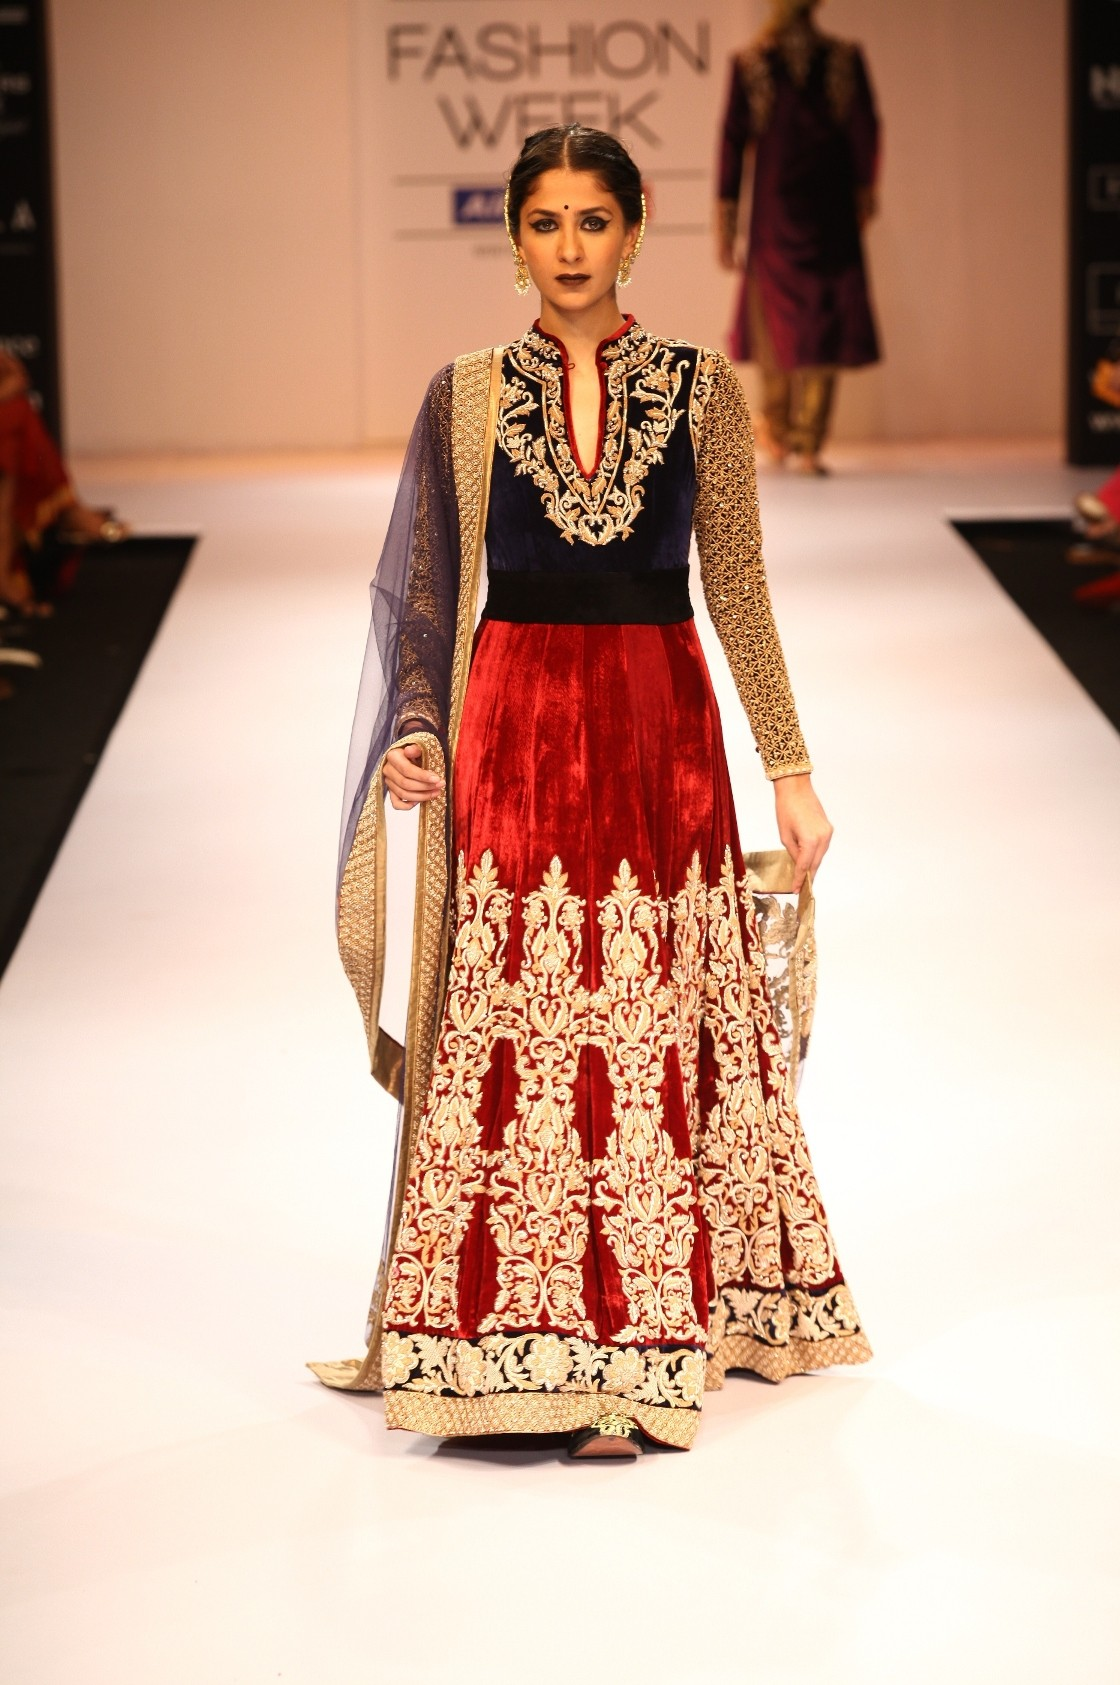 Fashion week Bhumika shyamal lfw winter festive for girls